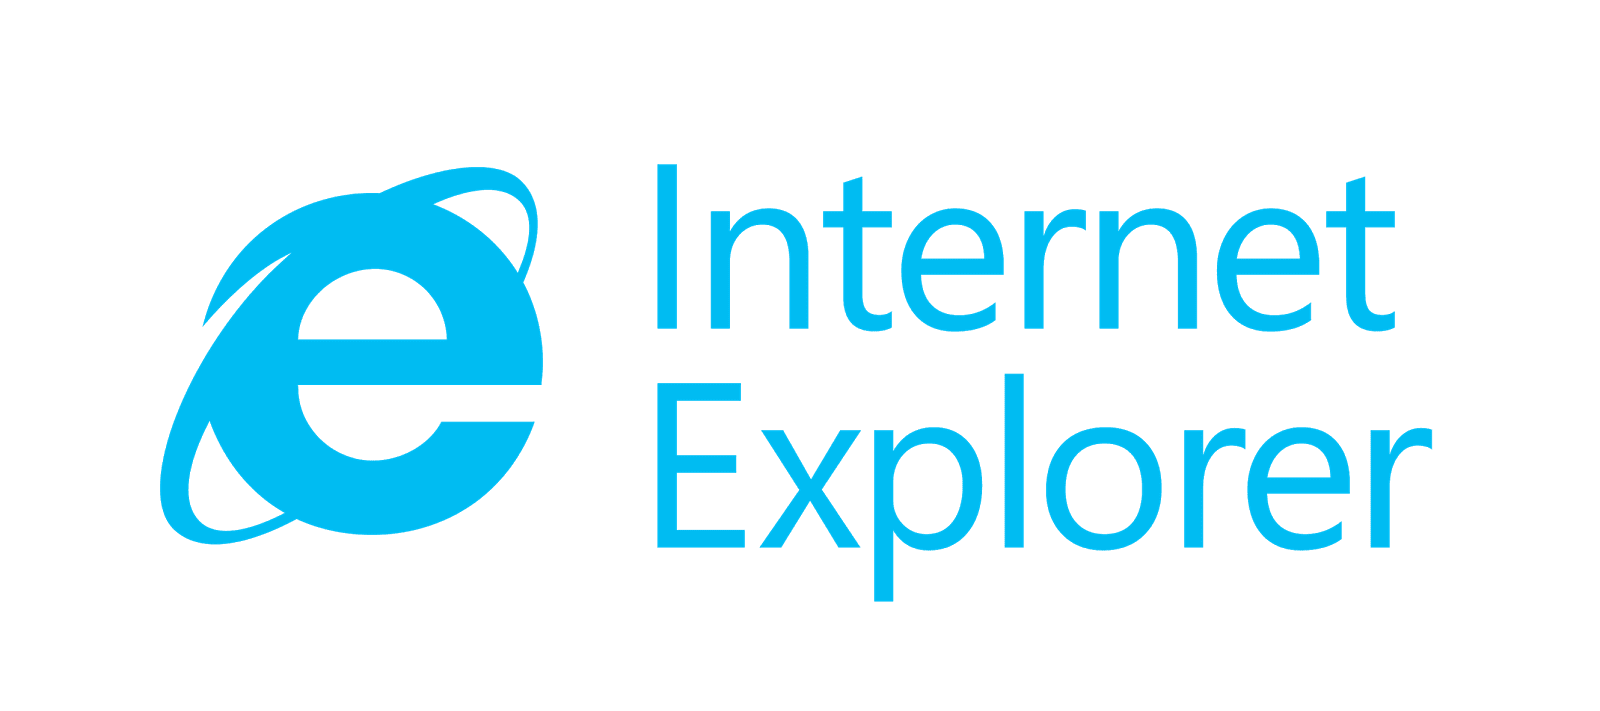 download internet explorer 11 windows 8.1 32 bit